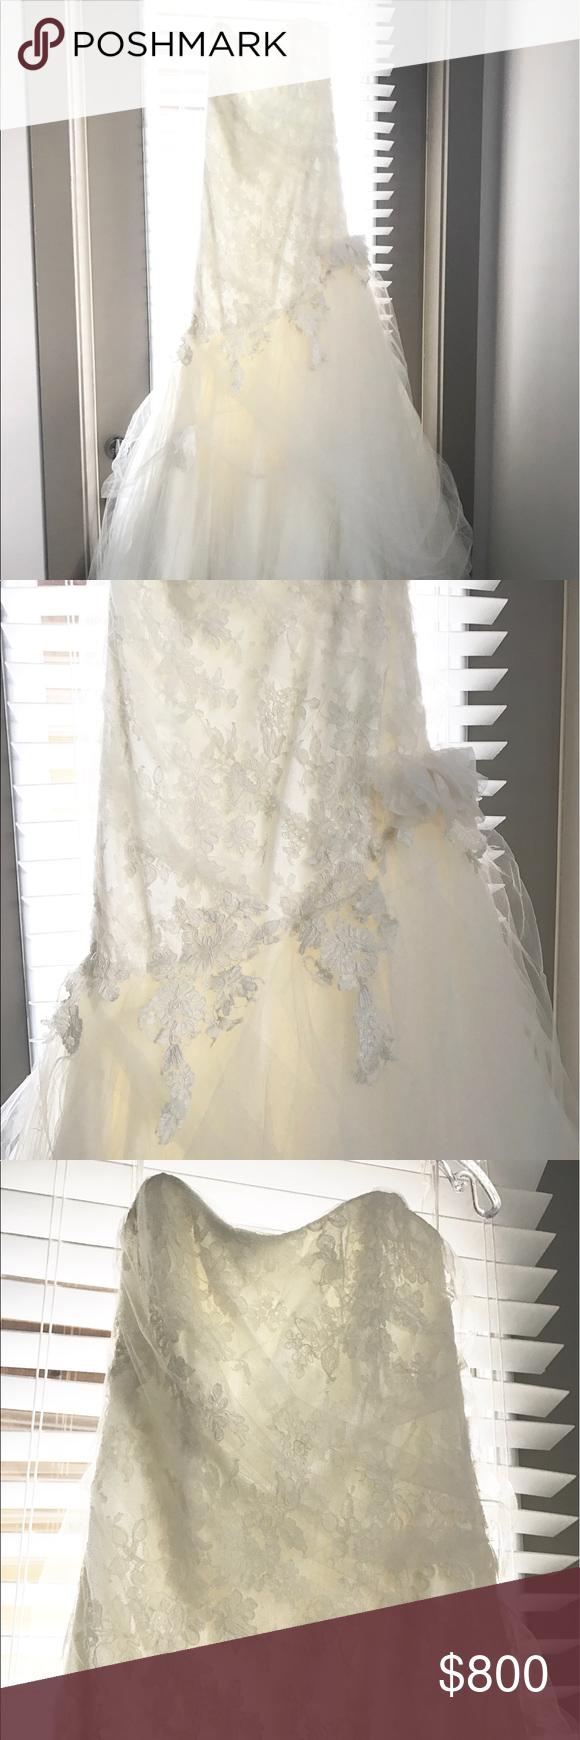 Marisa wedding dress  Marisa Lace Tulle Mermaid Wedding Gown Size   Size  Mermaid